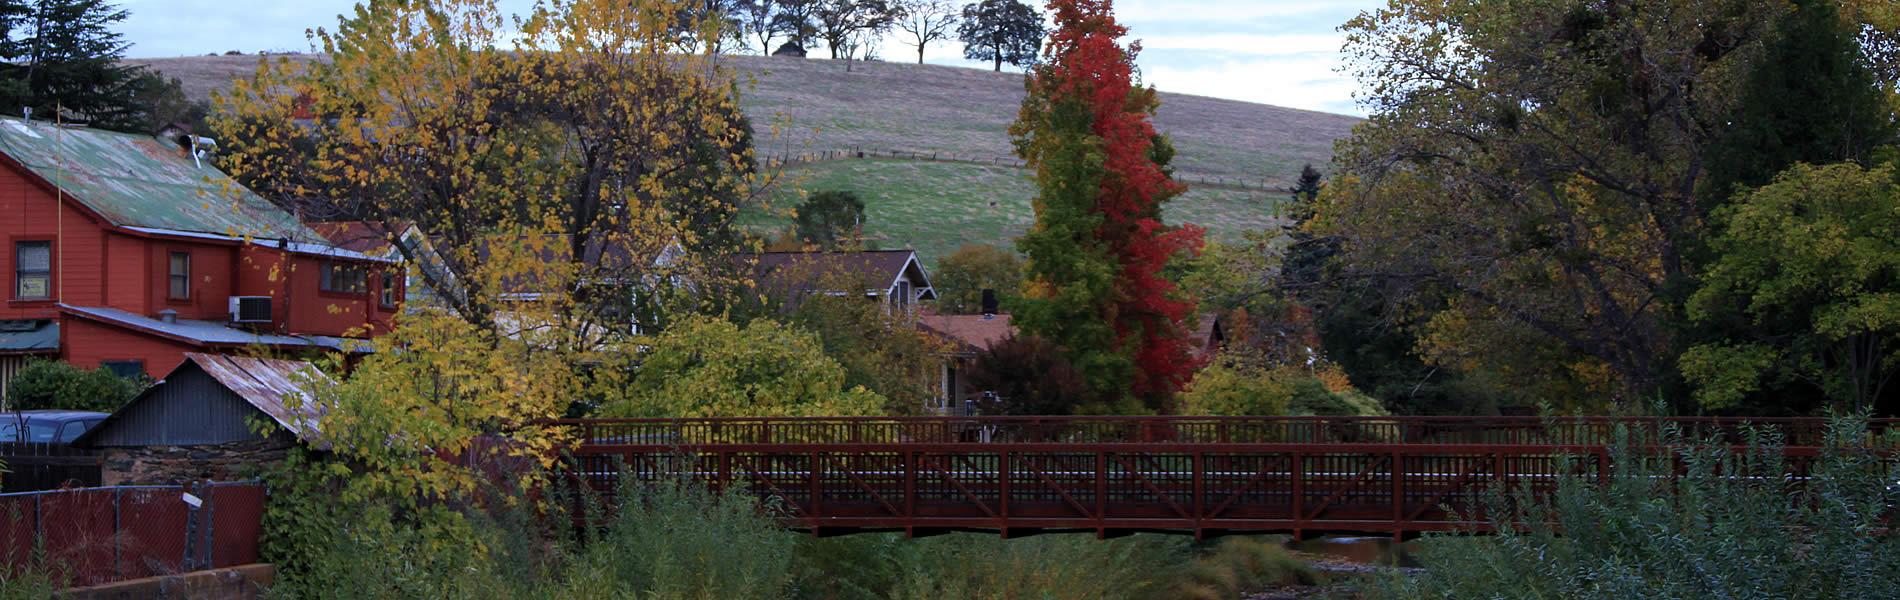 sutter creek california fall scene